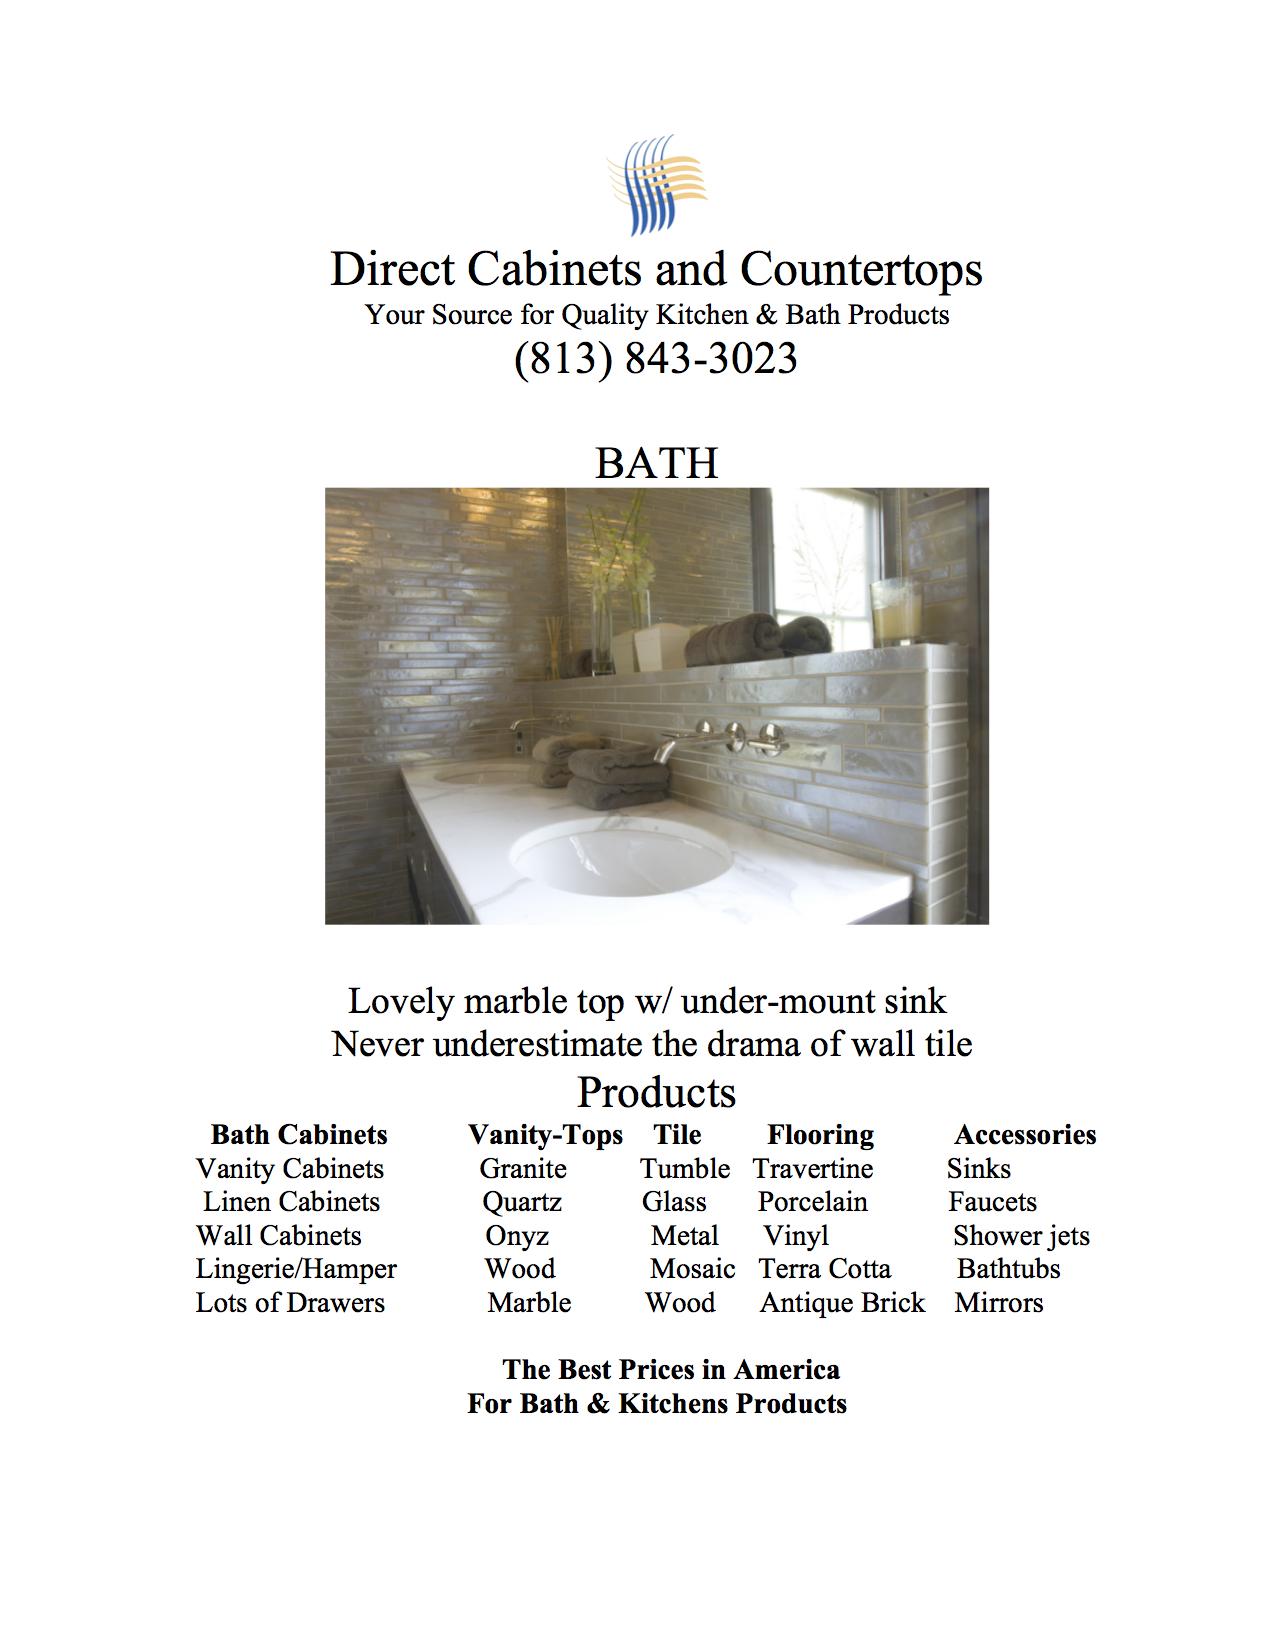 bathcabinet-1